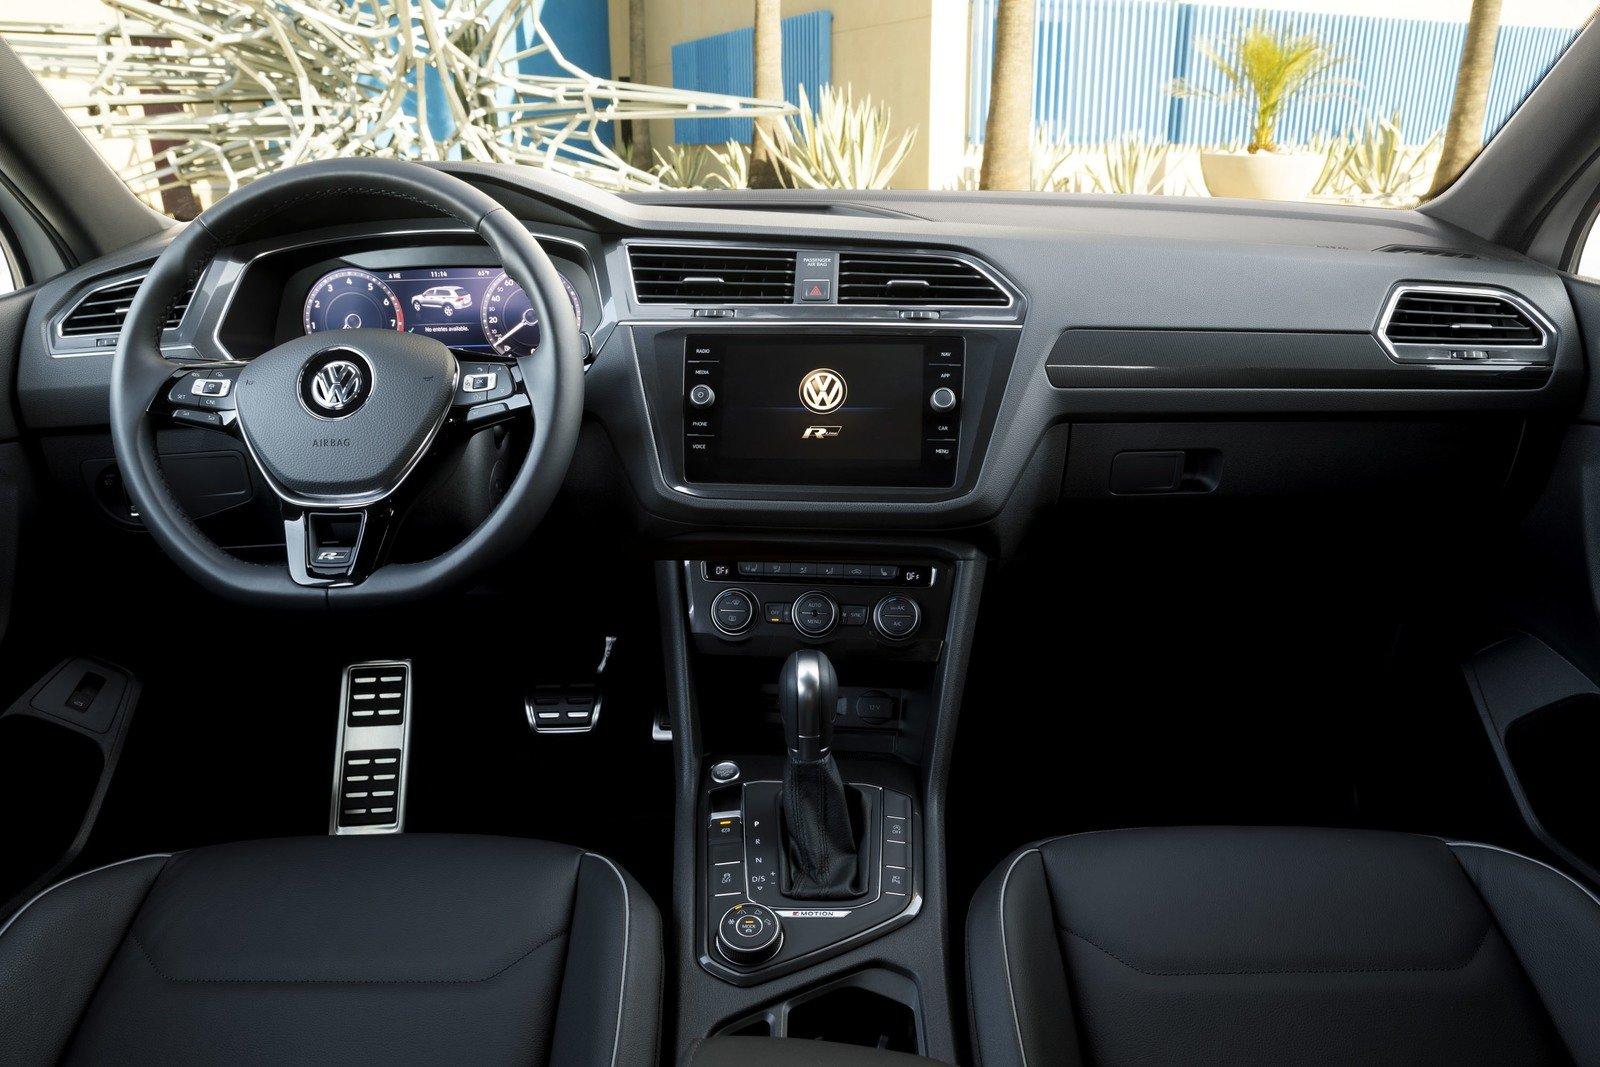 volkswagen unveils the tiguan 2018 r-line sports version Volkswagen unveils the Tiguan 2018 R-Line sports version  D8 AF D8 A7 D8 AE D9 84 D9 8A D8 A9  D9 81 D9 88 D9 84 D9 83 D8 B3  D9 88 D8 A7 D8 AC D9 86  D8 AA D9 8A D8 AC D9 88 D8 A7 D9 86 R Line 2018